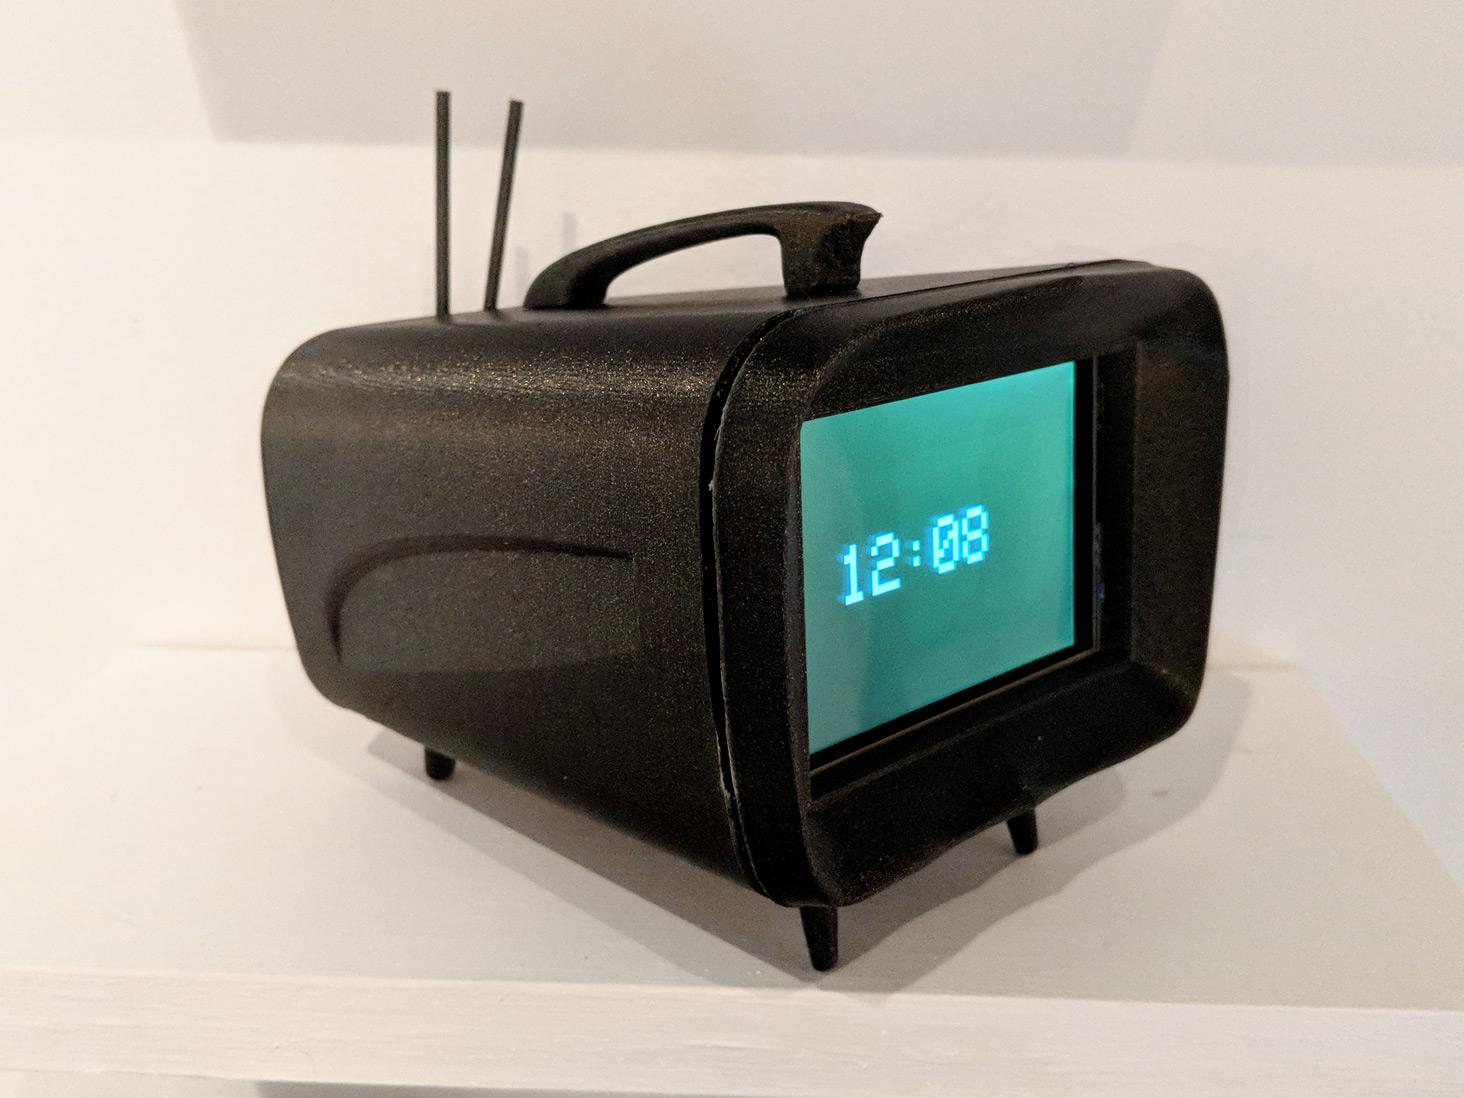 AtlTvHead   Model A AO5 (Black),    3D Printed PLA casing, LCD screen, ESP 32, 5.5 x 5.5 x 5 inches